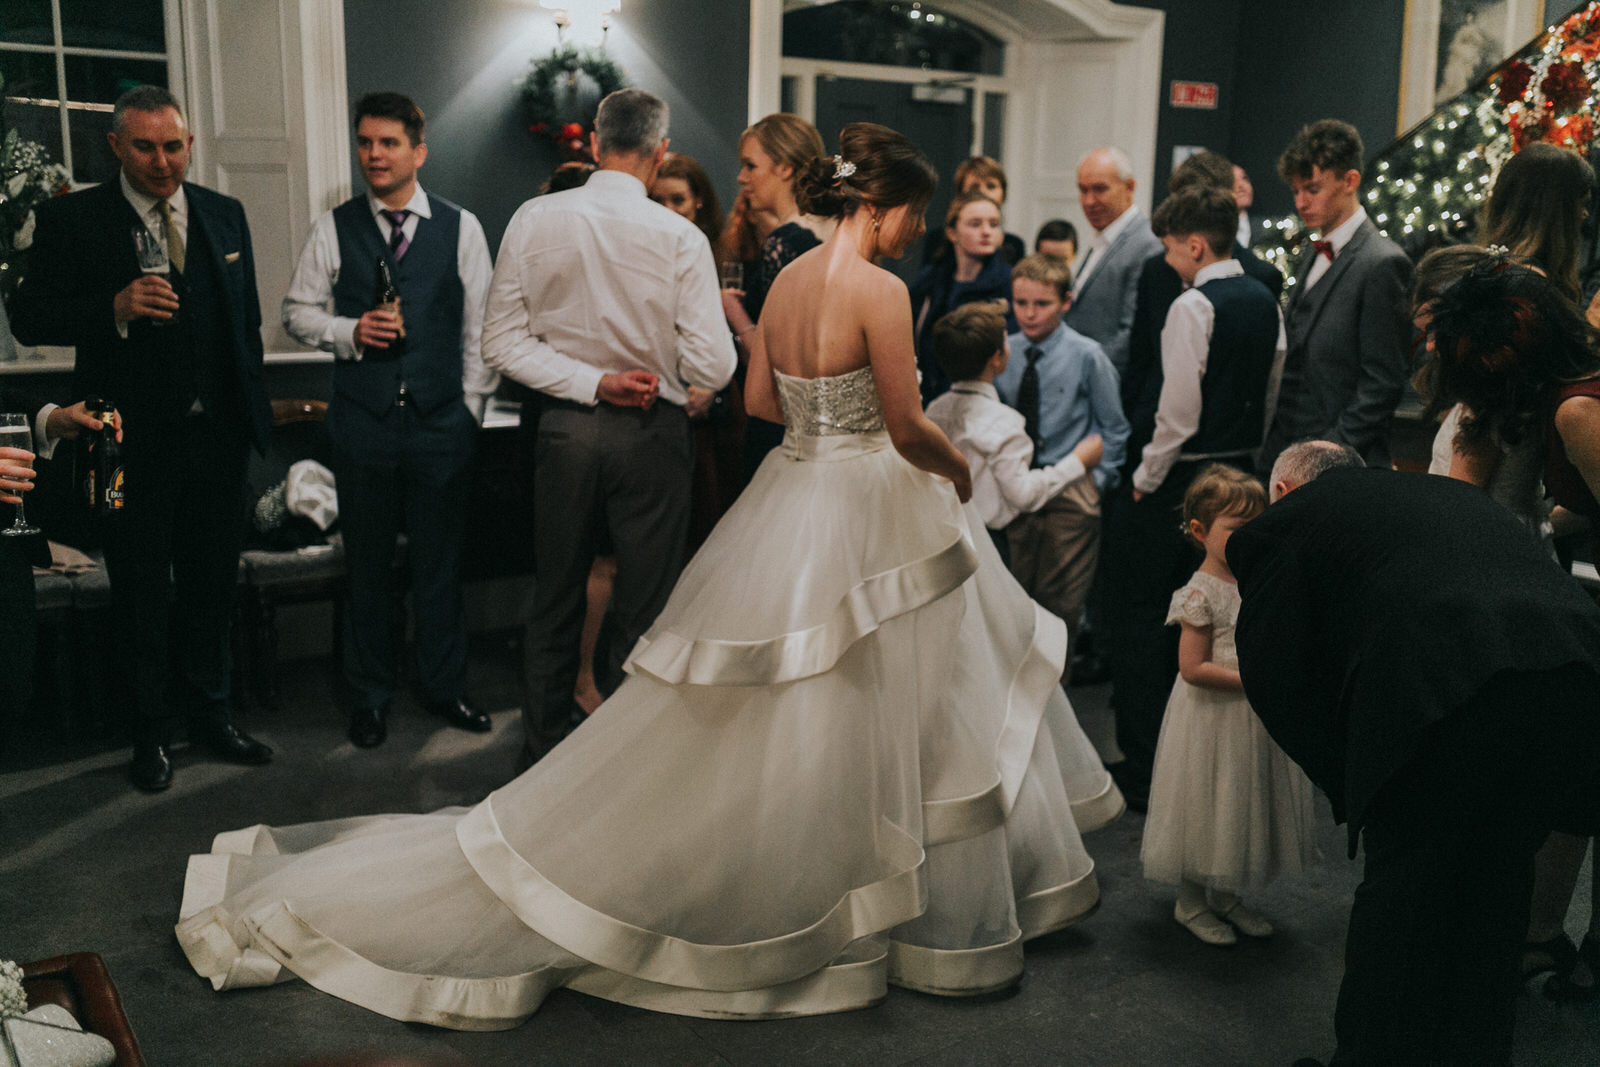 Clonabreany_wedding-photographer_roger_kenny_ireland_096.jpg